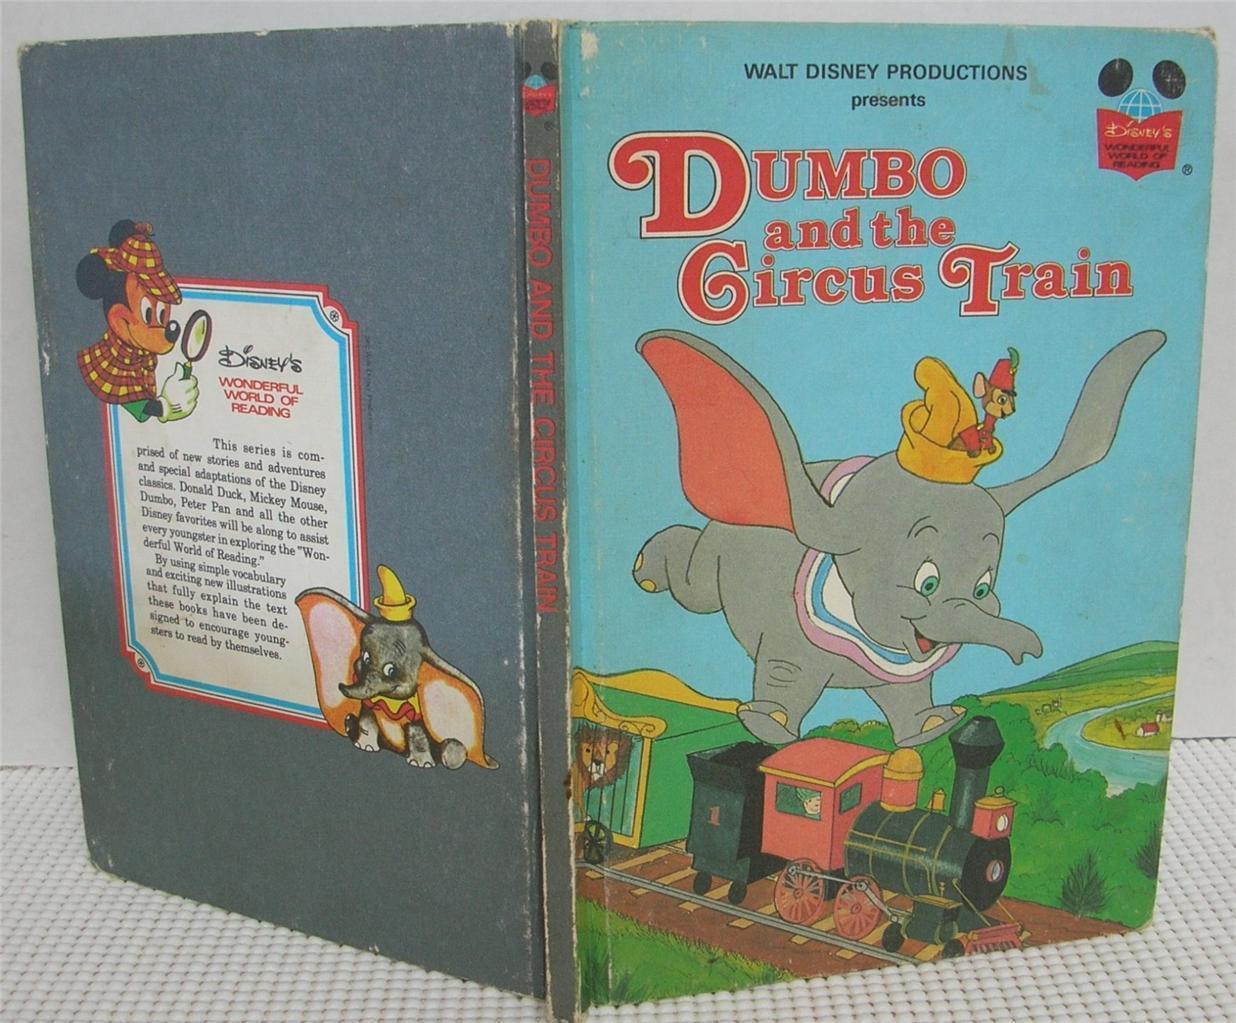 Dumbo and the Circus Train